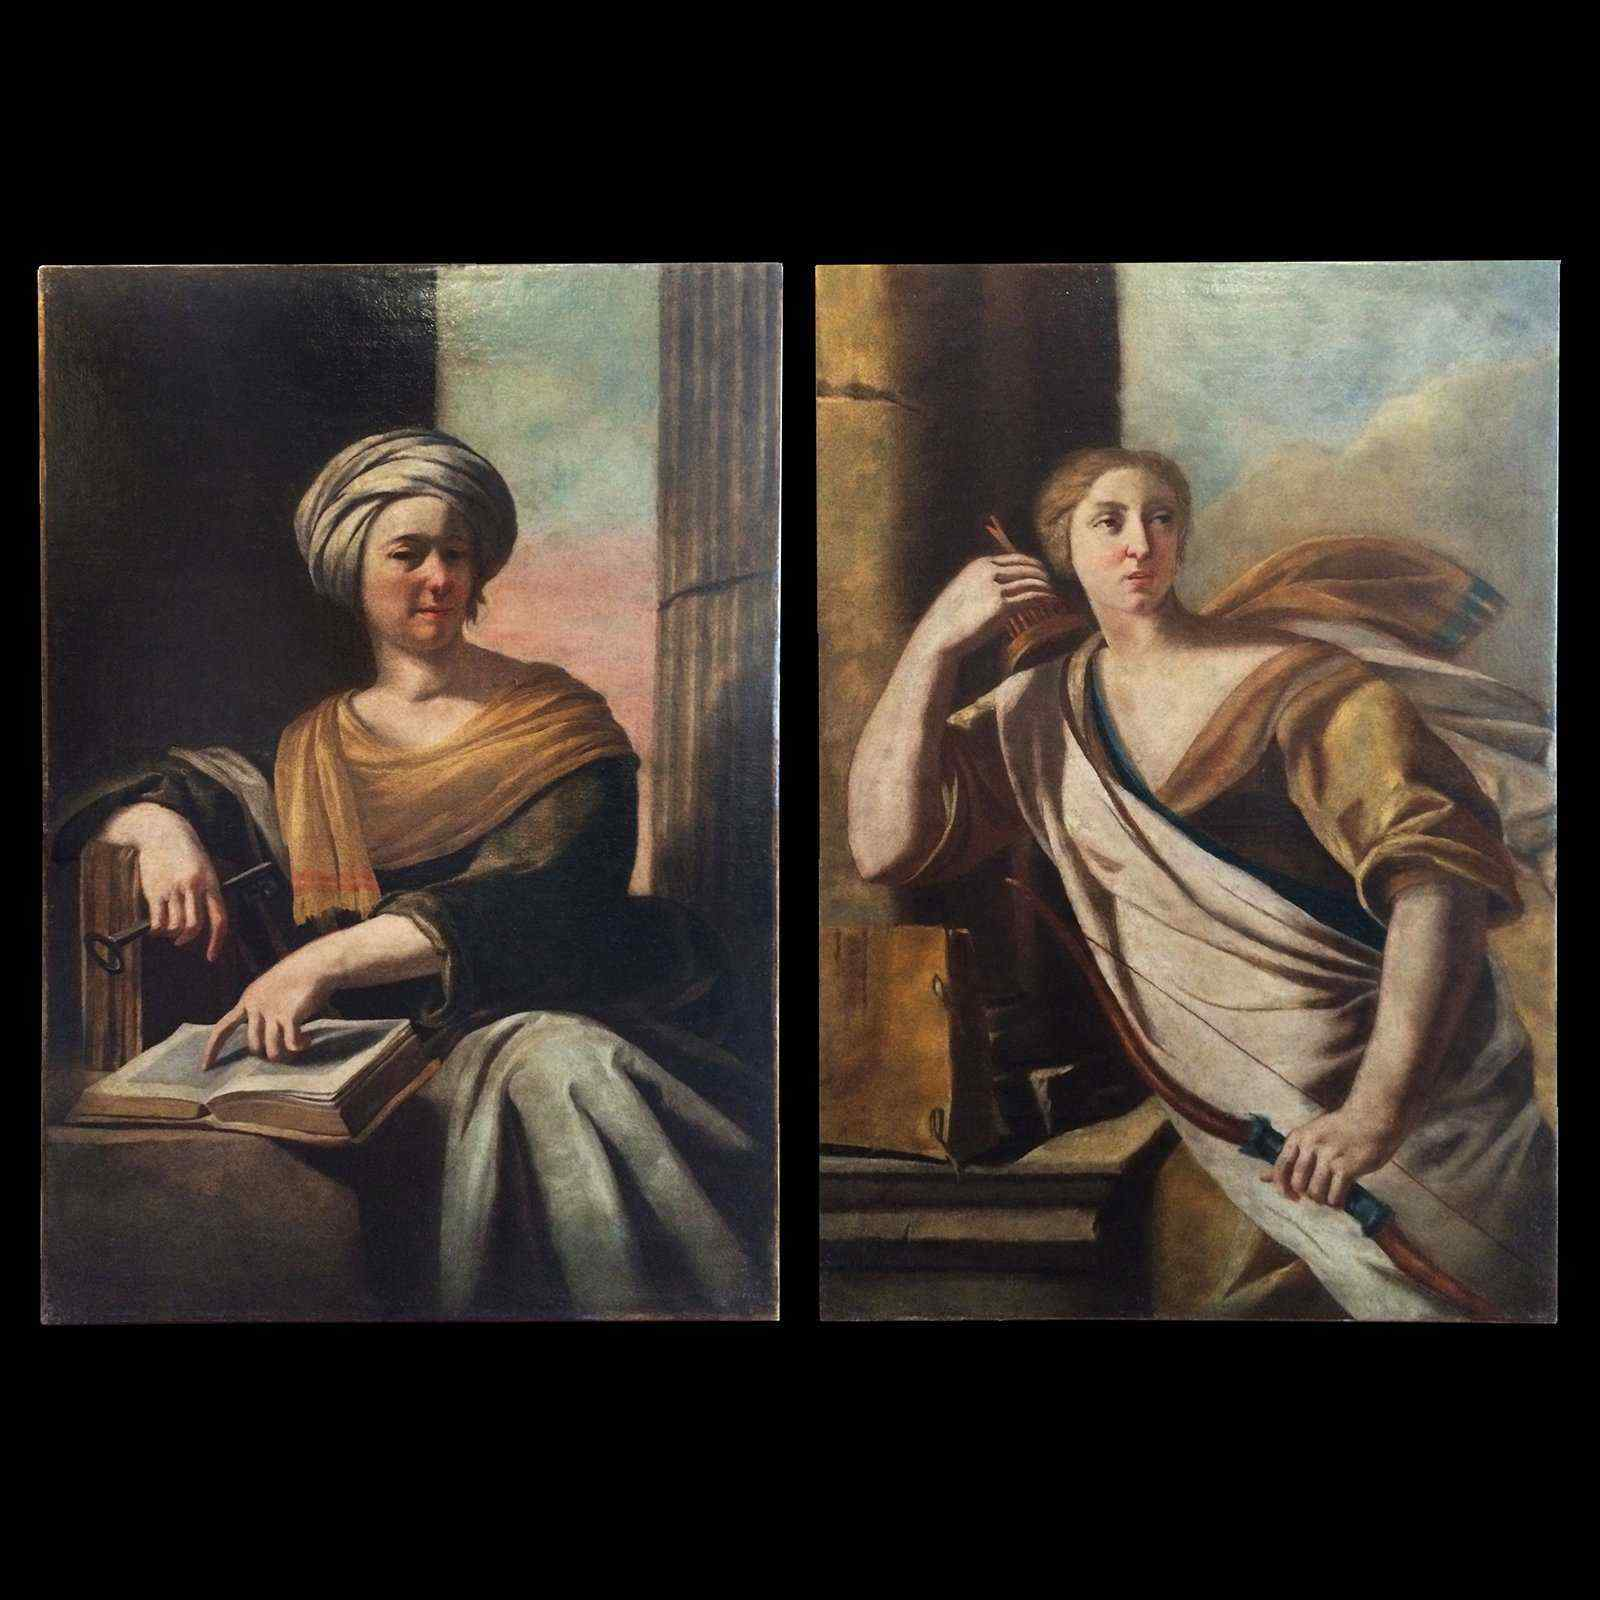 Пара аллегорических портретов XVII века Франция